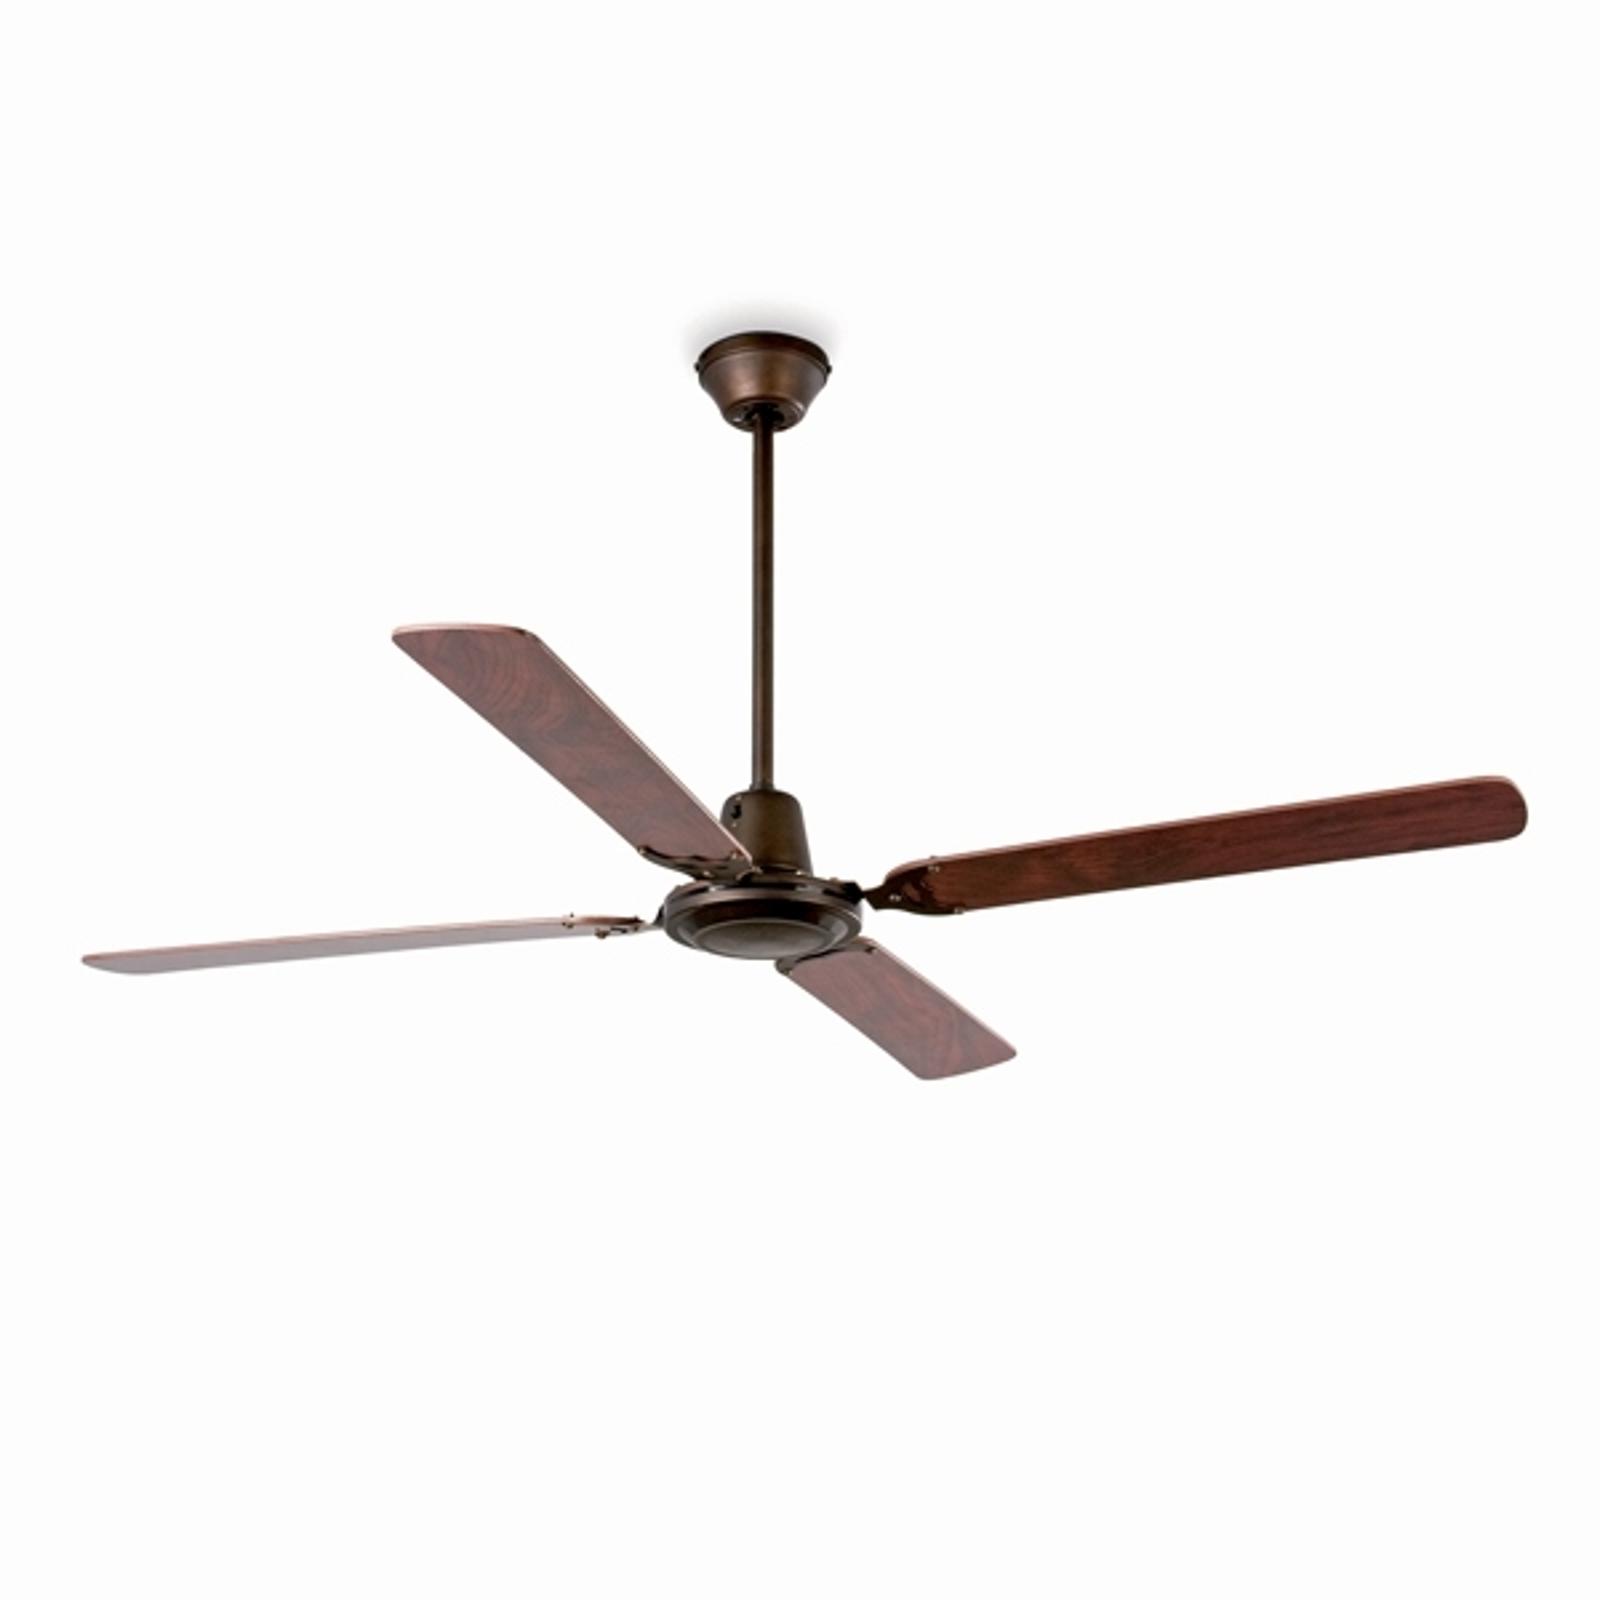 MALVINAS modern ceiling fan, brown_3506066_1